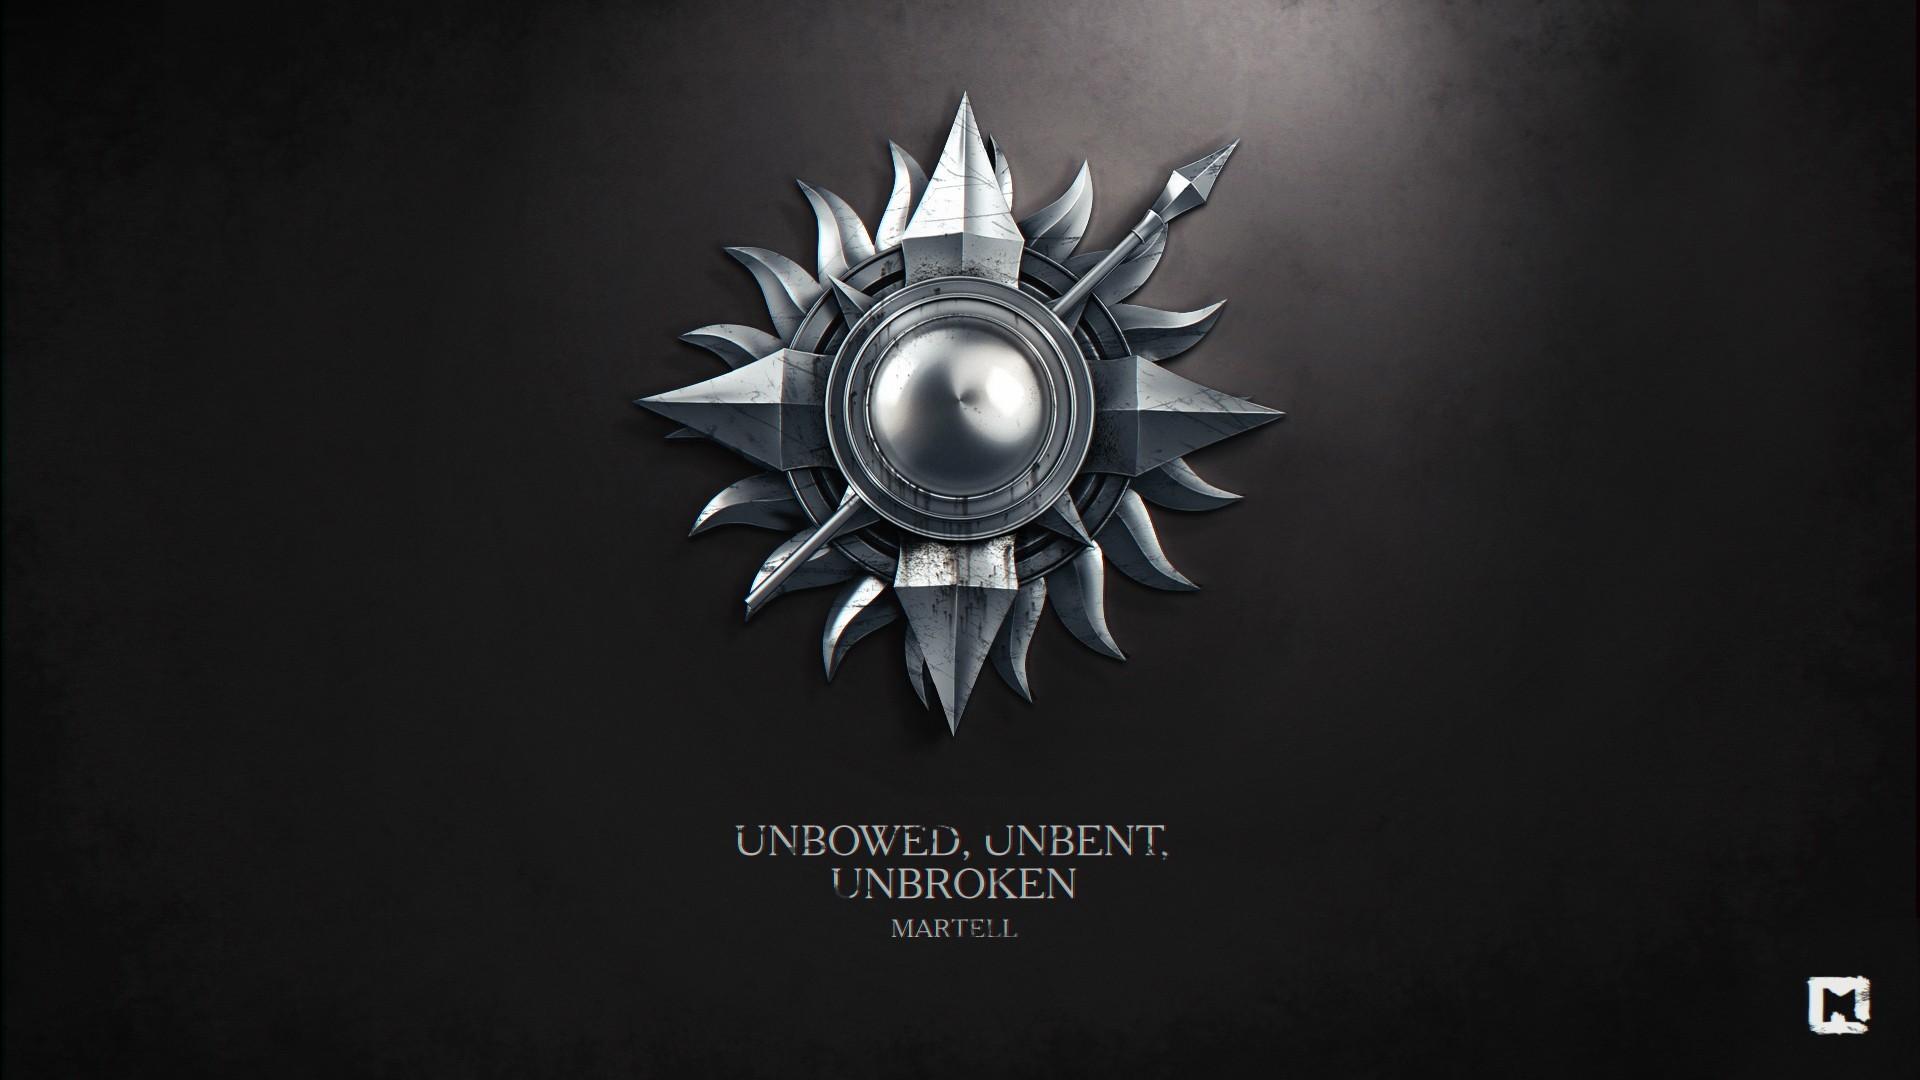 Game-of-Thrones-¡-HD-Megapost-1920x1080-Taringa-wallpaper-wp340512